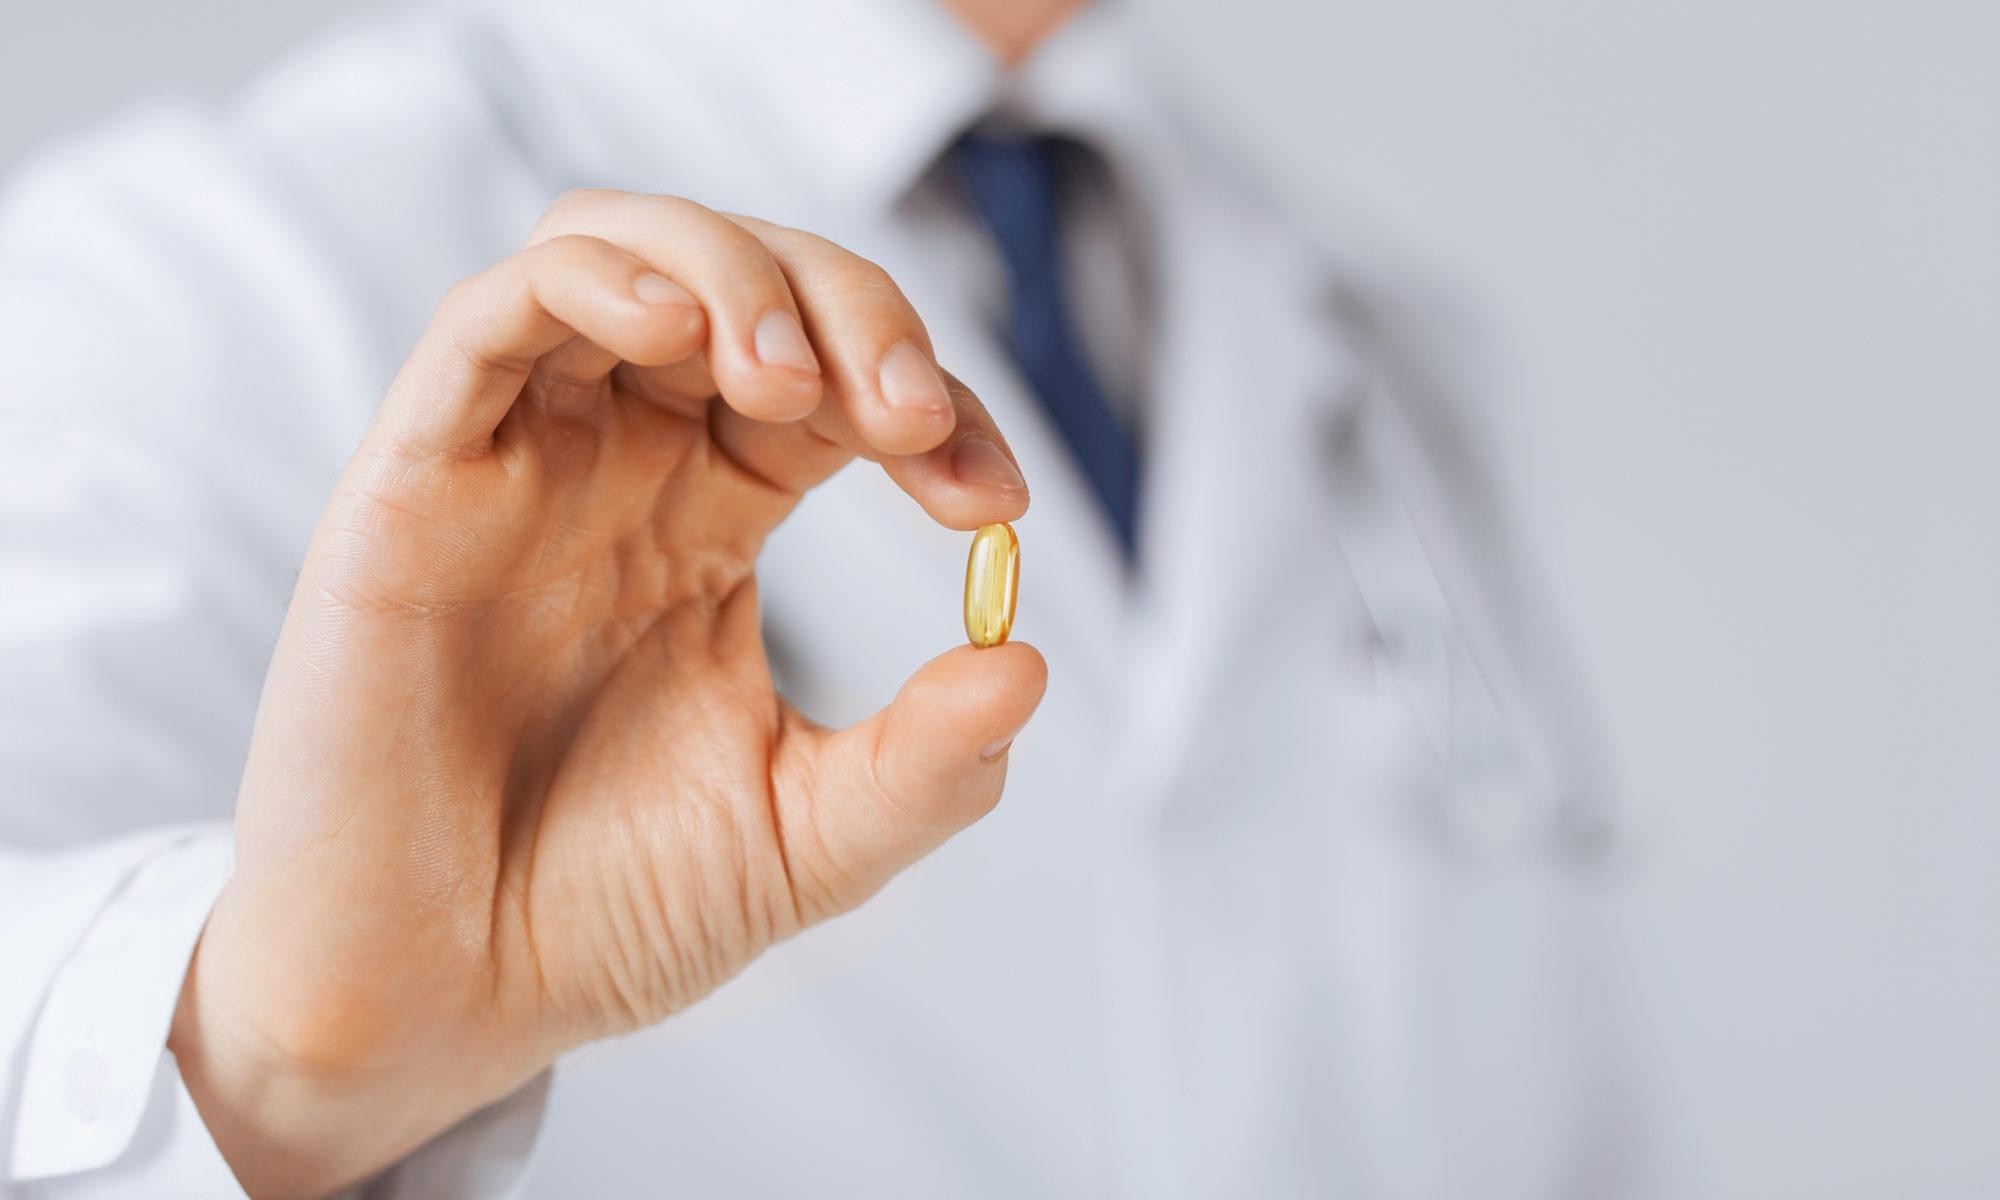 Omesam capsule in doctor hand